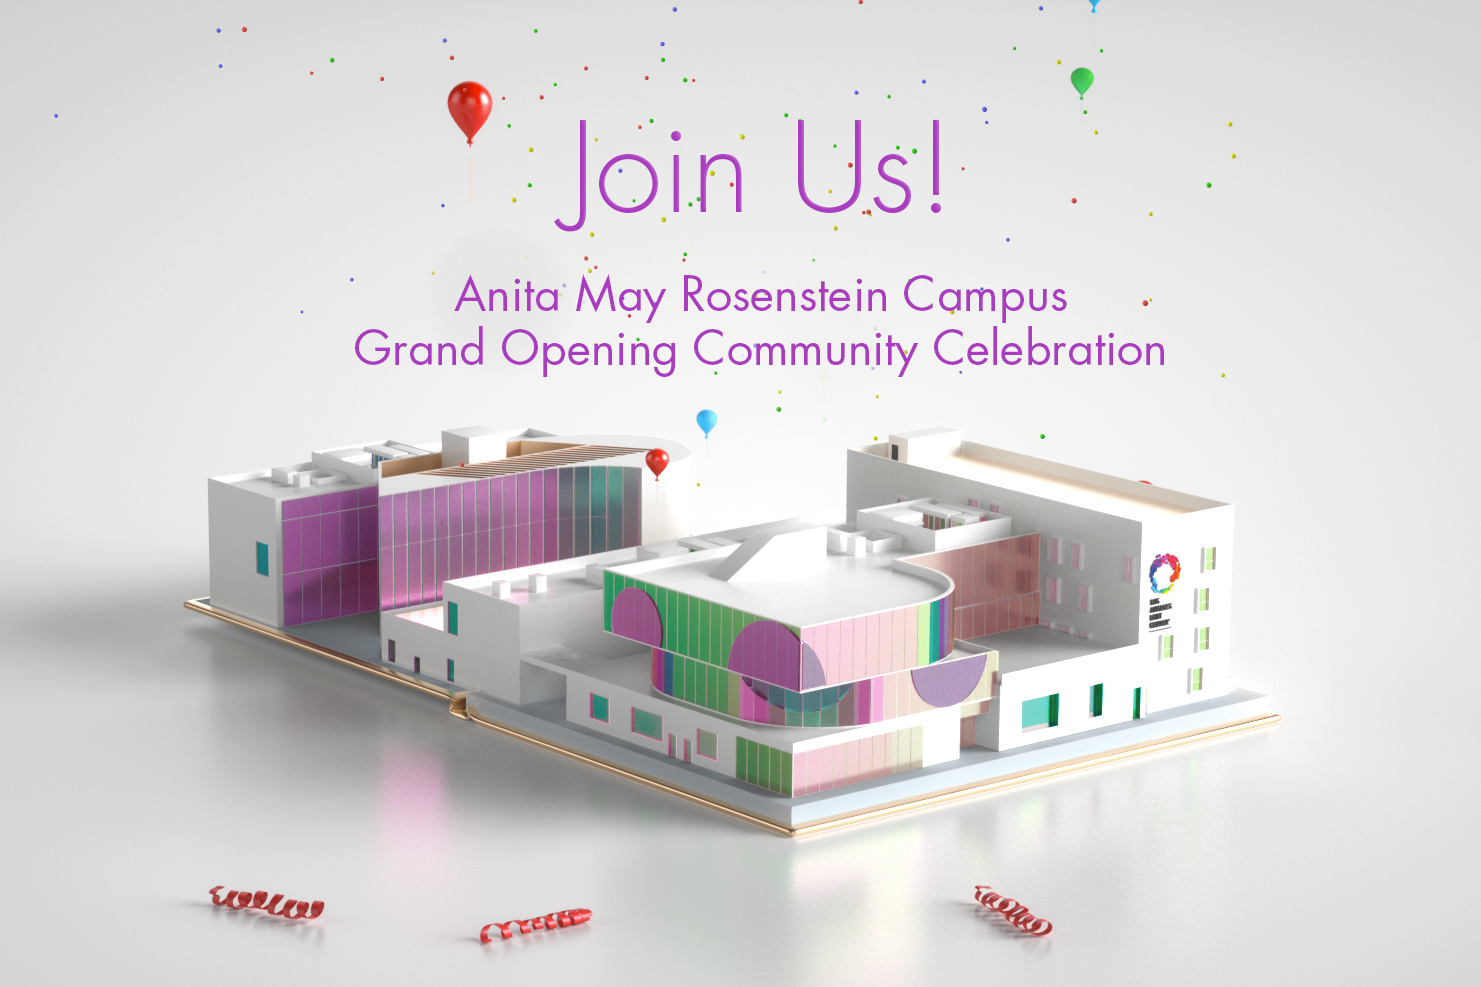 Anita May Rosenstein Campus Grand Opening Community Celebration